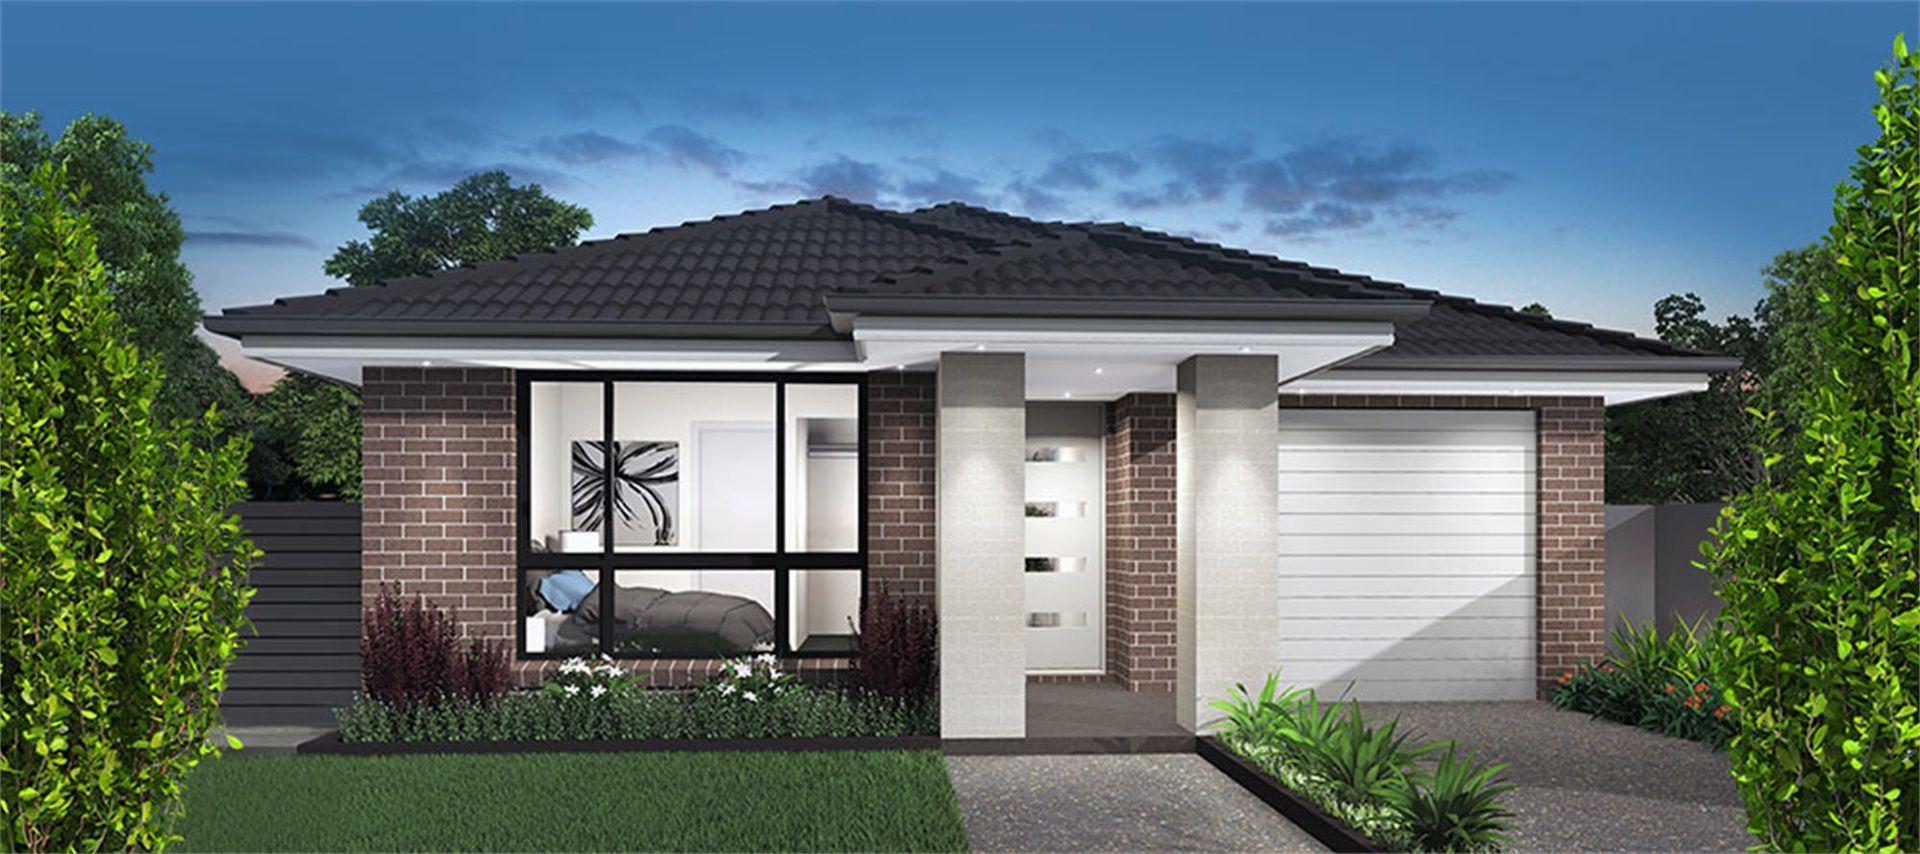 Lot 3014 Cameron Grove, Cameron Park NSW 2285, Image 0